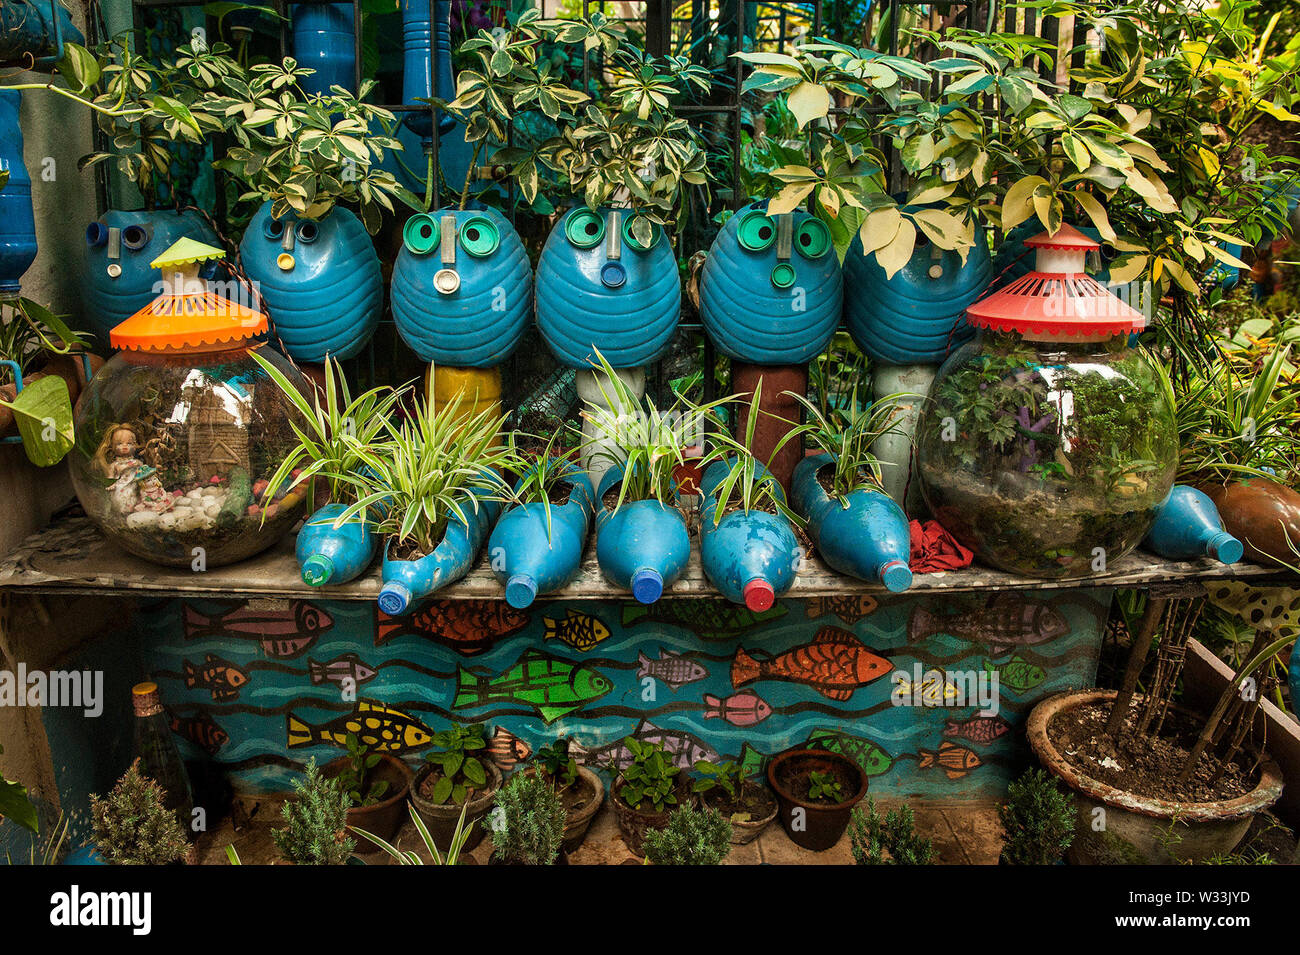 Kolkata 12th July 2019 Decorated Pots And Plants Made By